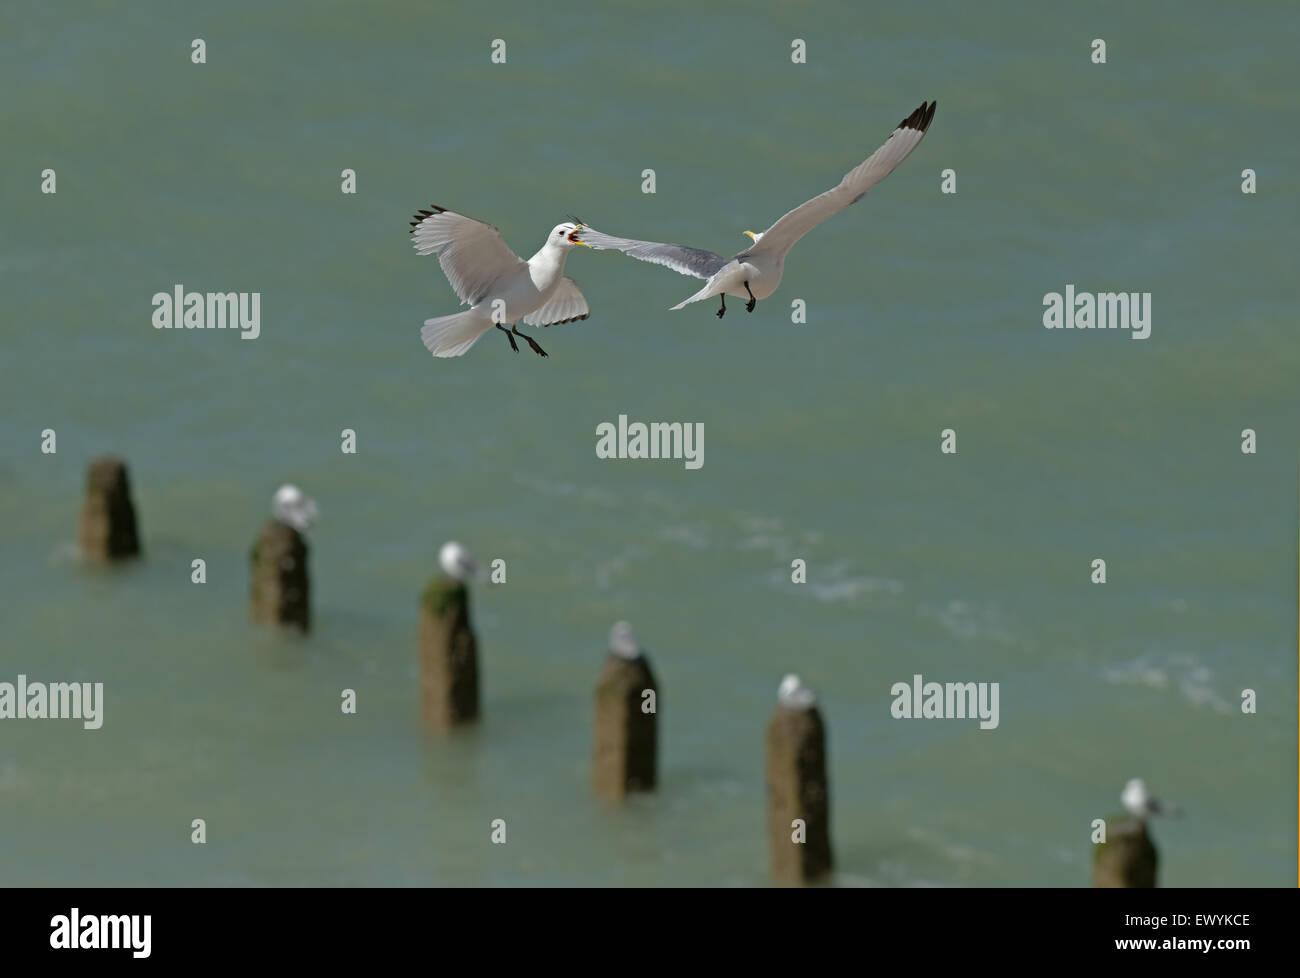 Dreizehenmöwen-Larus Tridactyla im Flug dispays Aggression. Sommer. UK Stockfoto